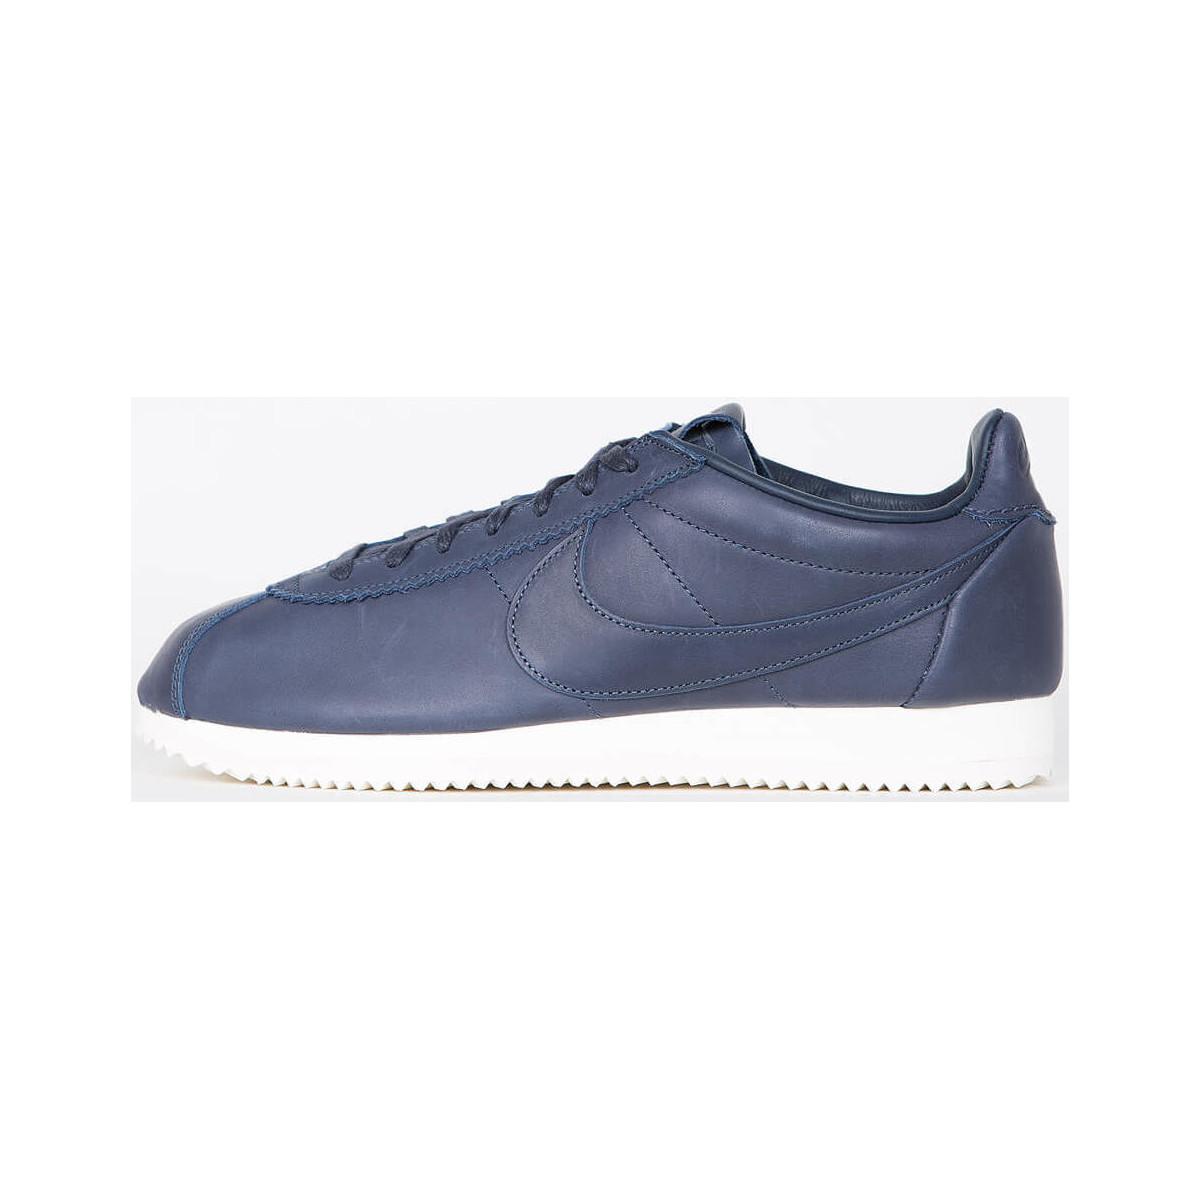 reputable site f2c2c 79ee5 Nike Nike Classic Cortez Premium QS TZ 534 - Chaussures Baskets basses Homme  69,00 €